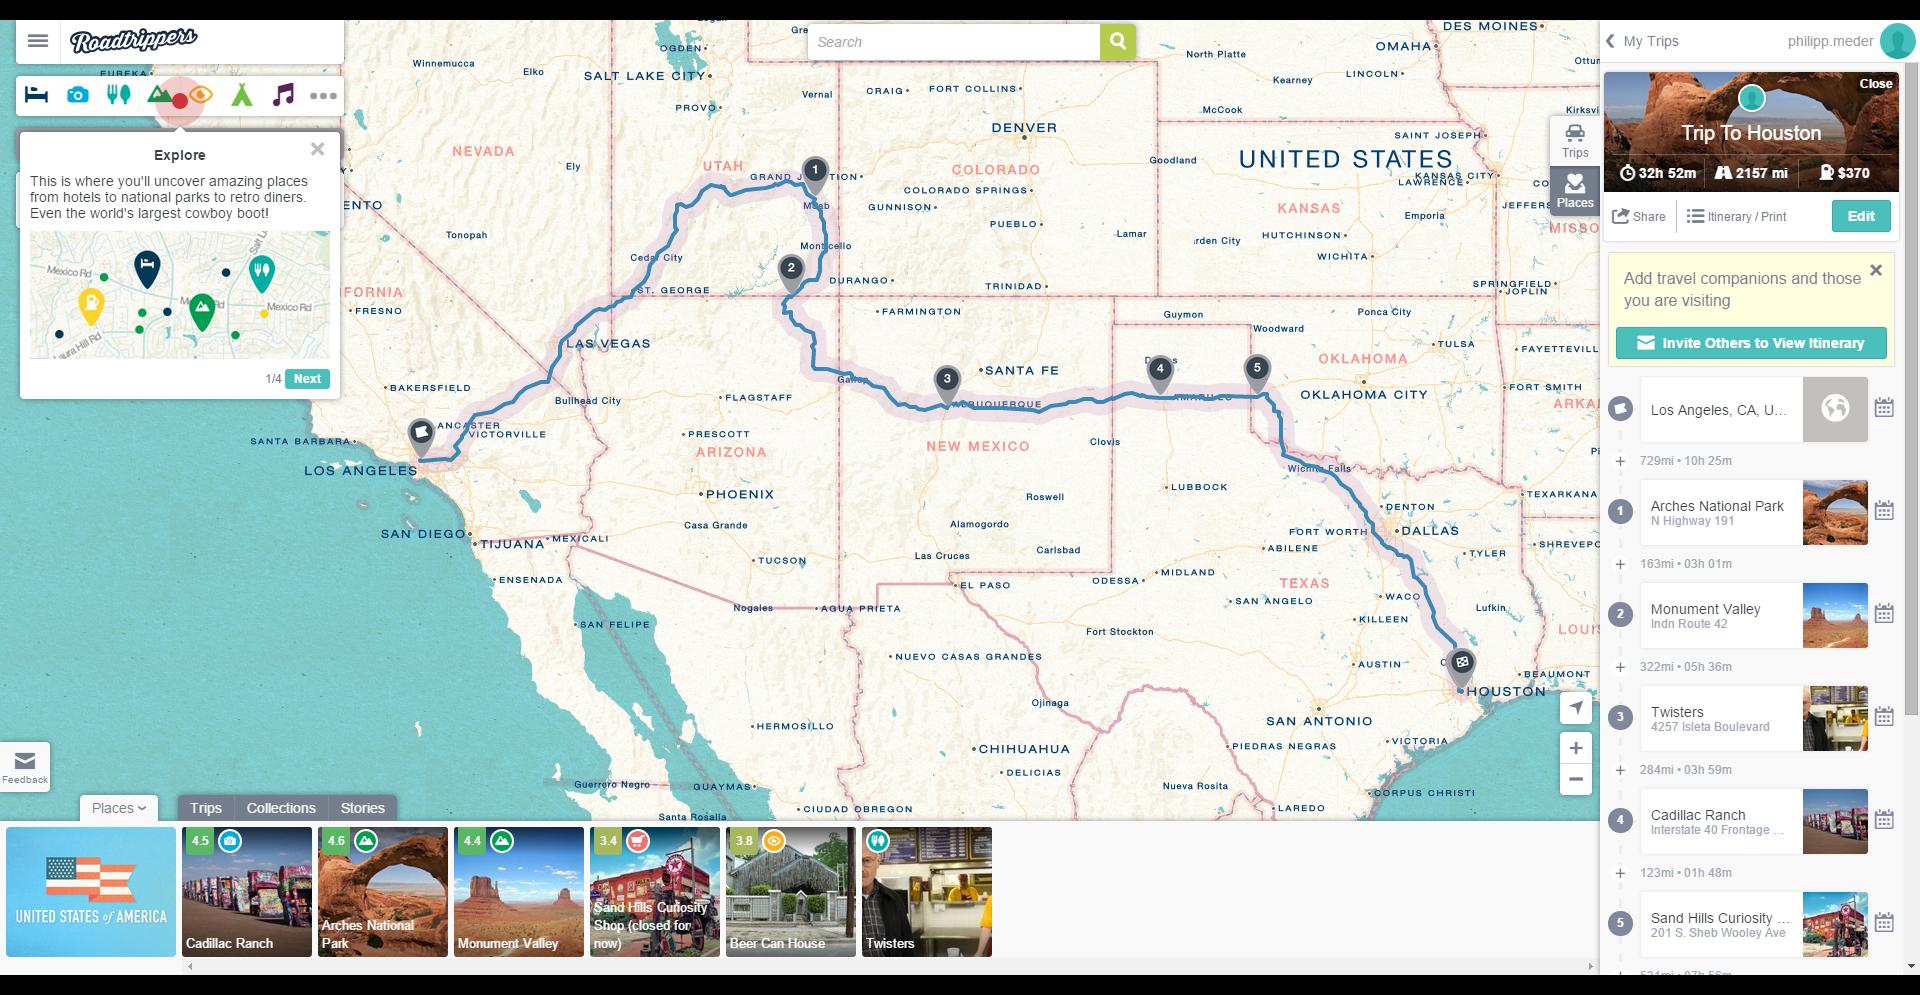 Trip To Houston Roadtrip - Roadtrippers